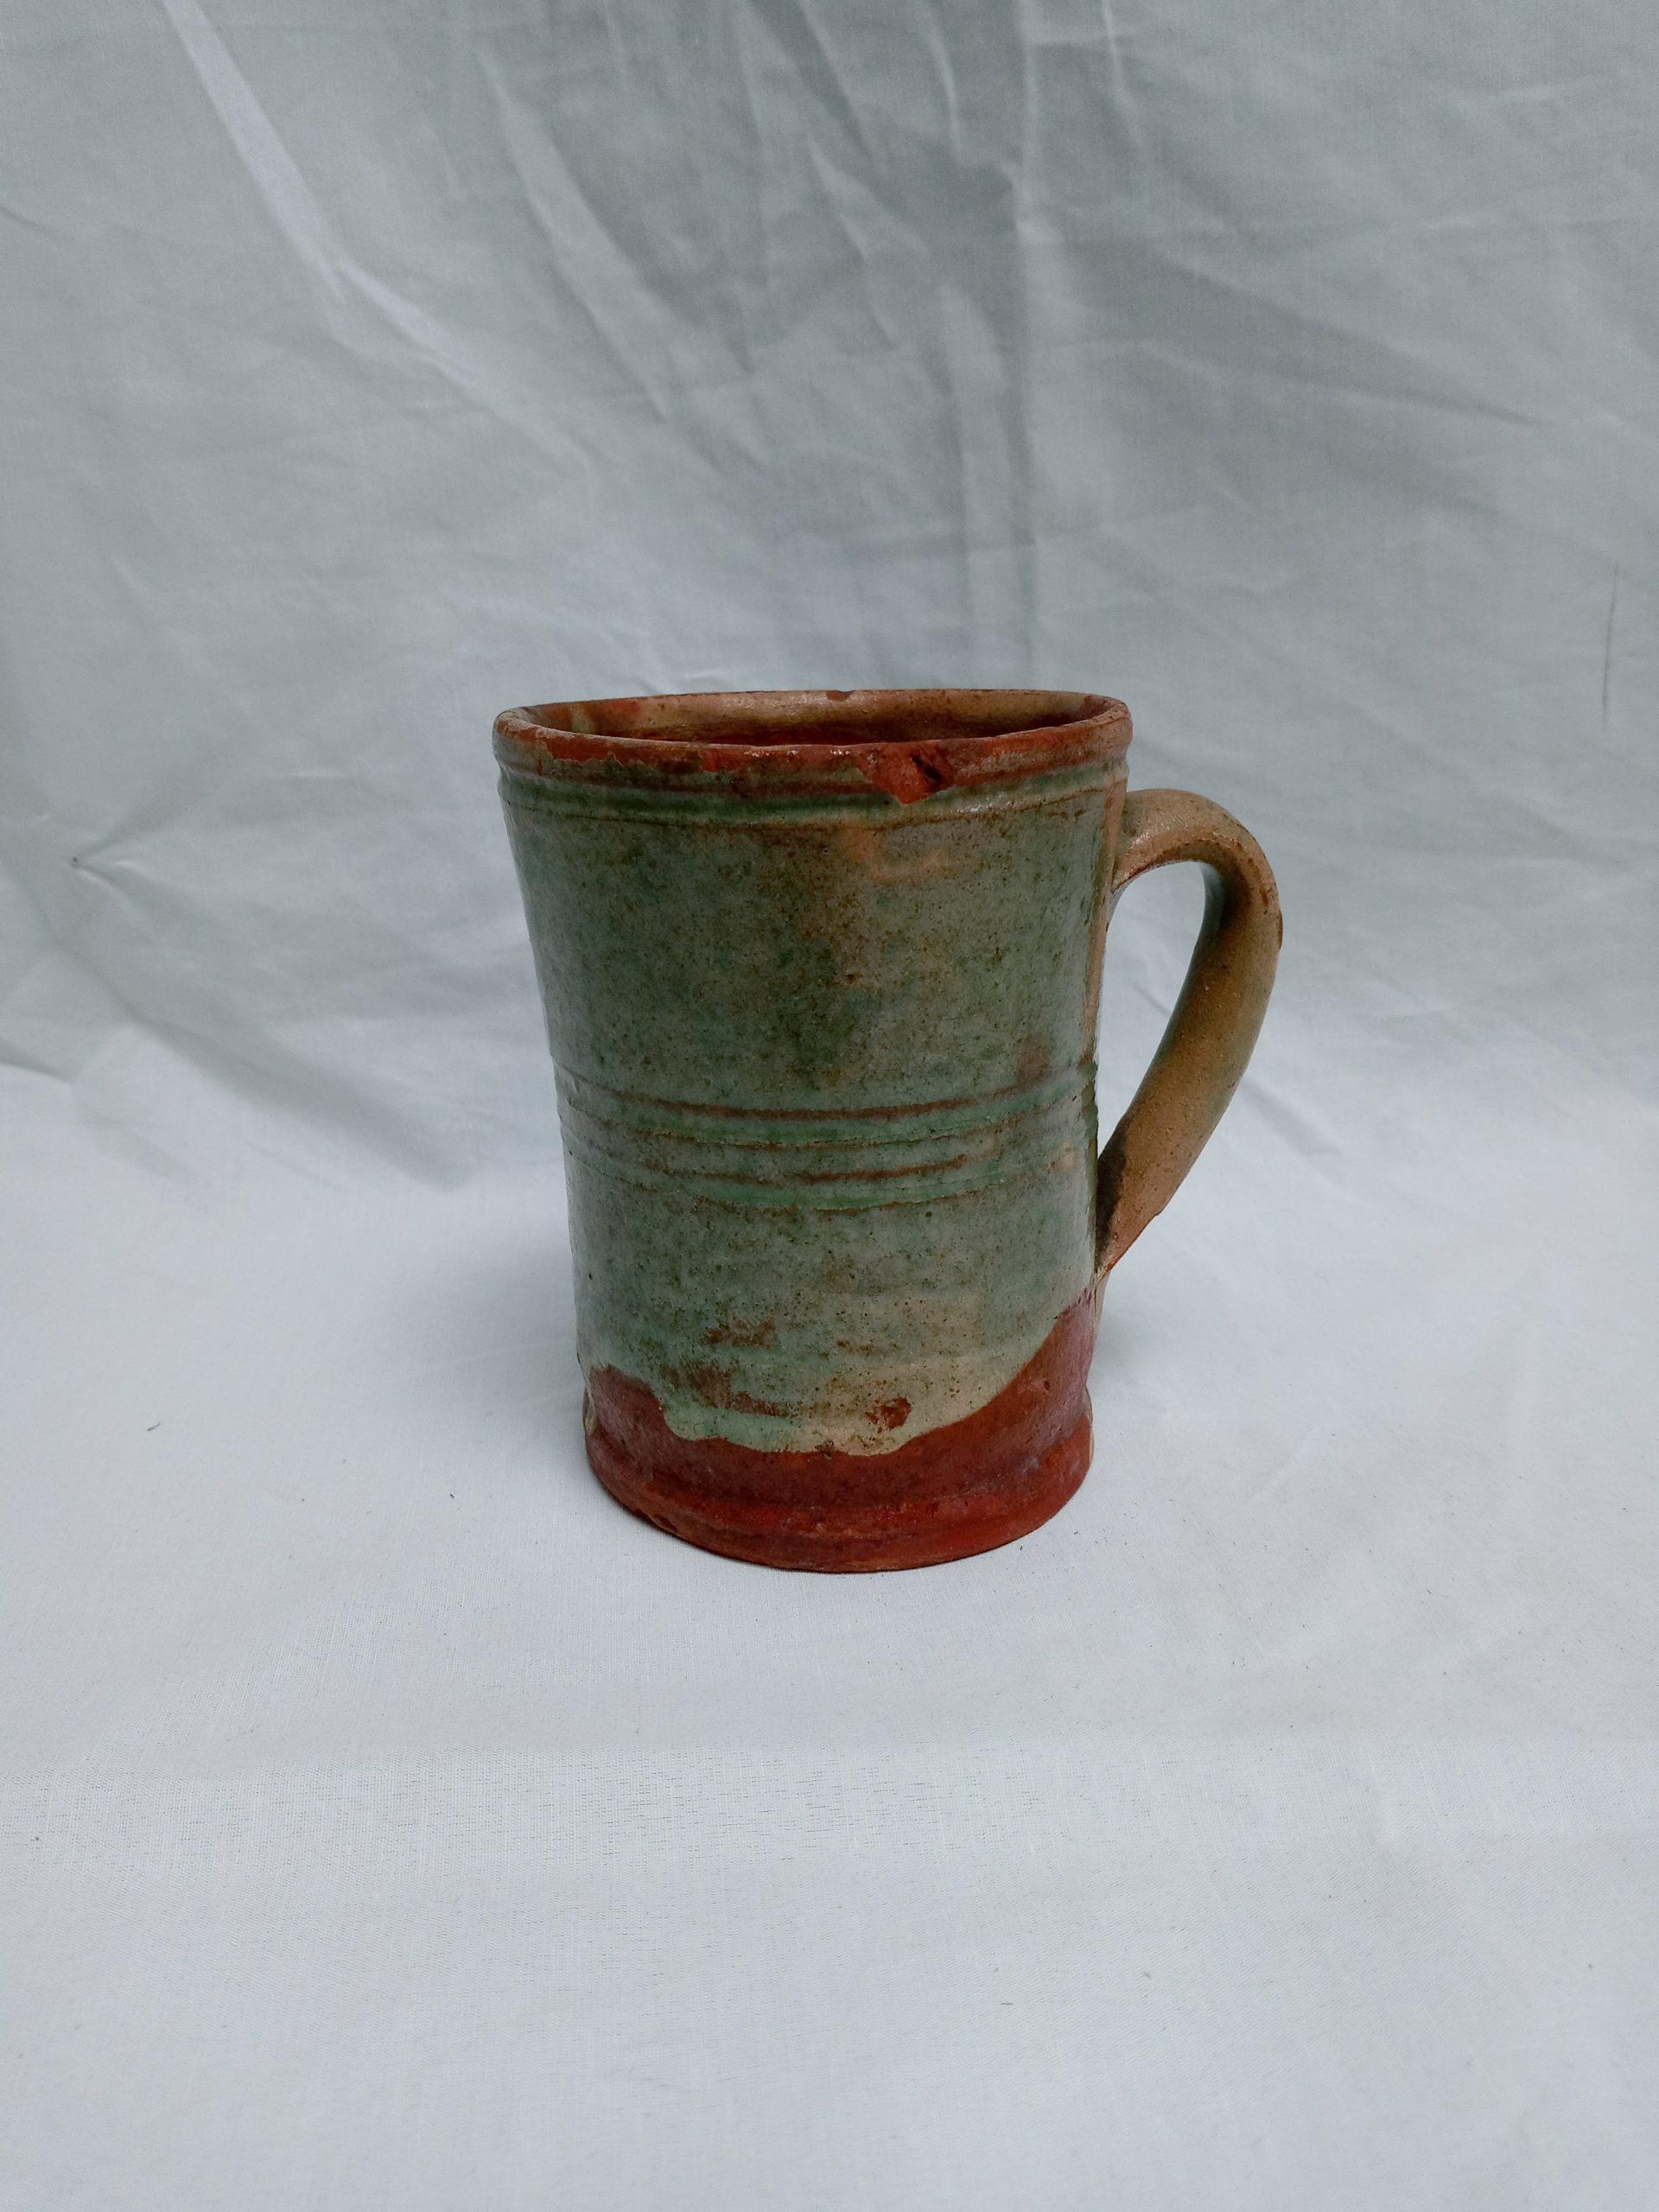 200-35624 Redware Pottery Handled Mug, yellow, green overall slip glaze, minor rim wear. Image